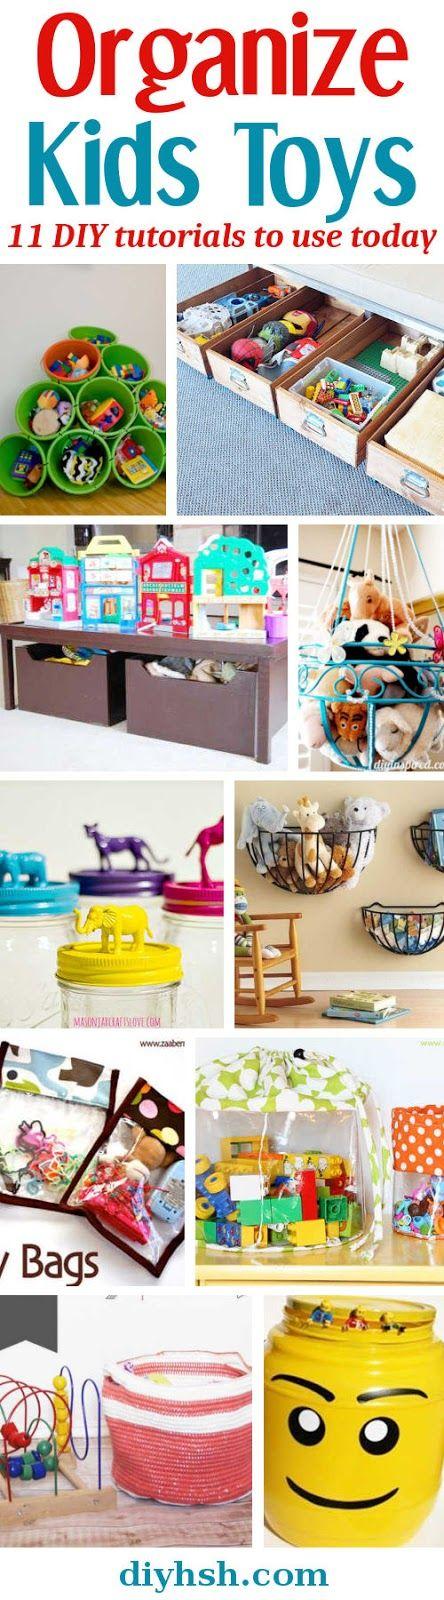 Organize Kids Toys. 11 DIY Tutorials. #Family #Organize #Storage #KidsRoom